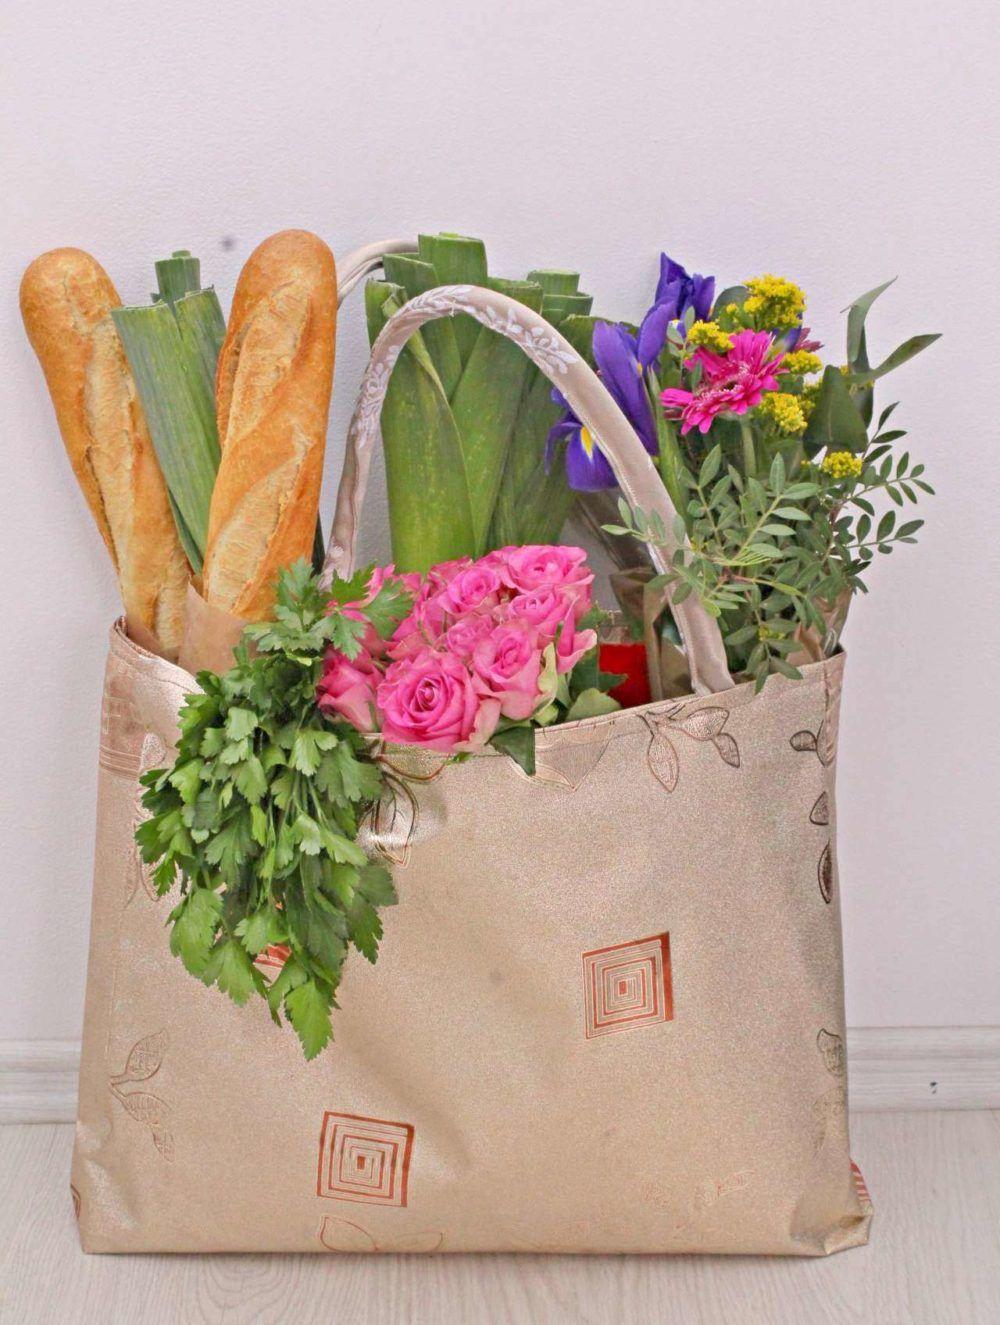 2018 Household Planner Free Printable Diy bags no sew